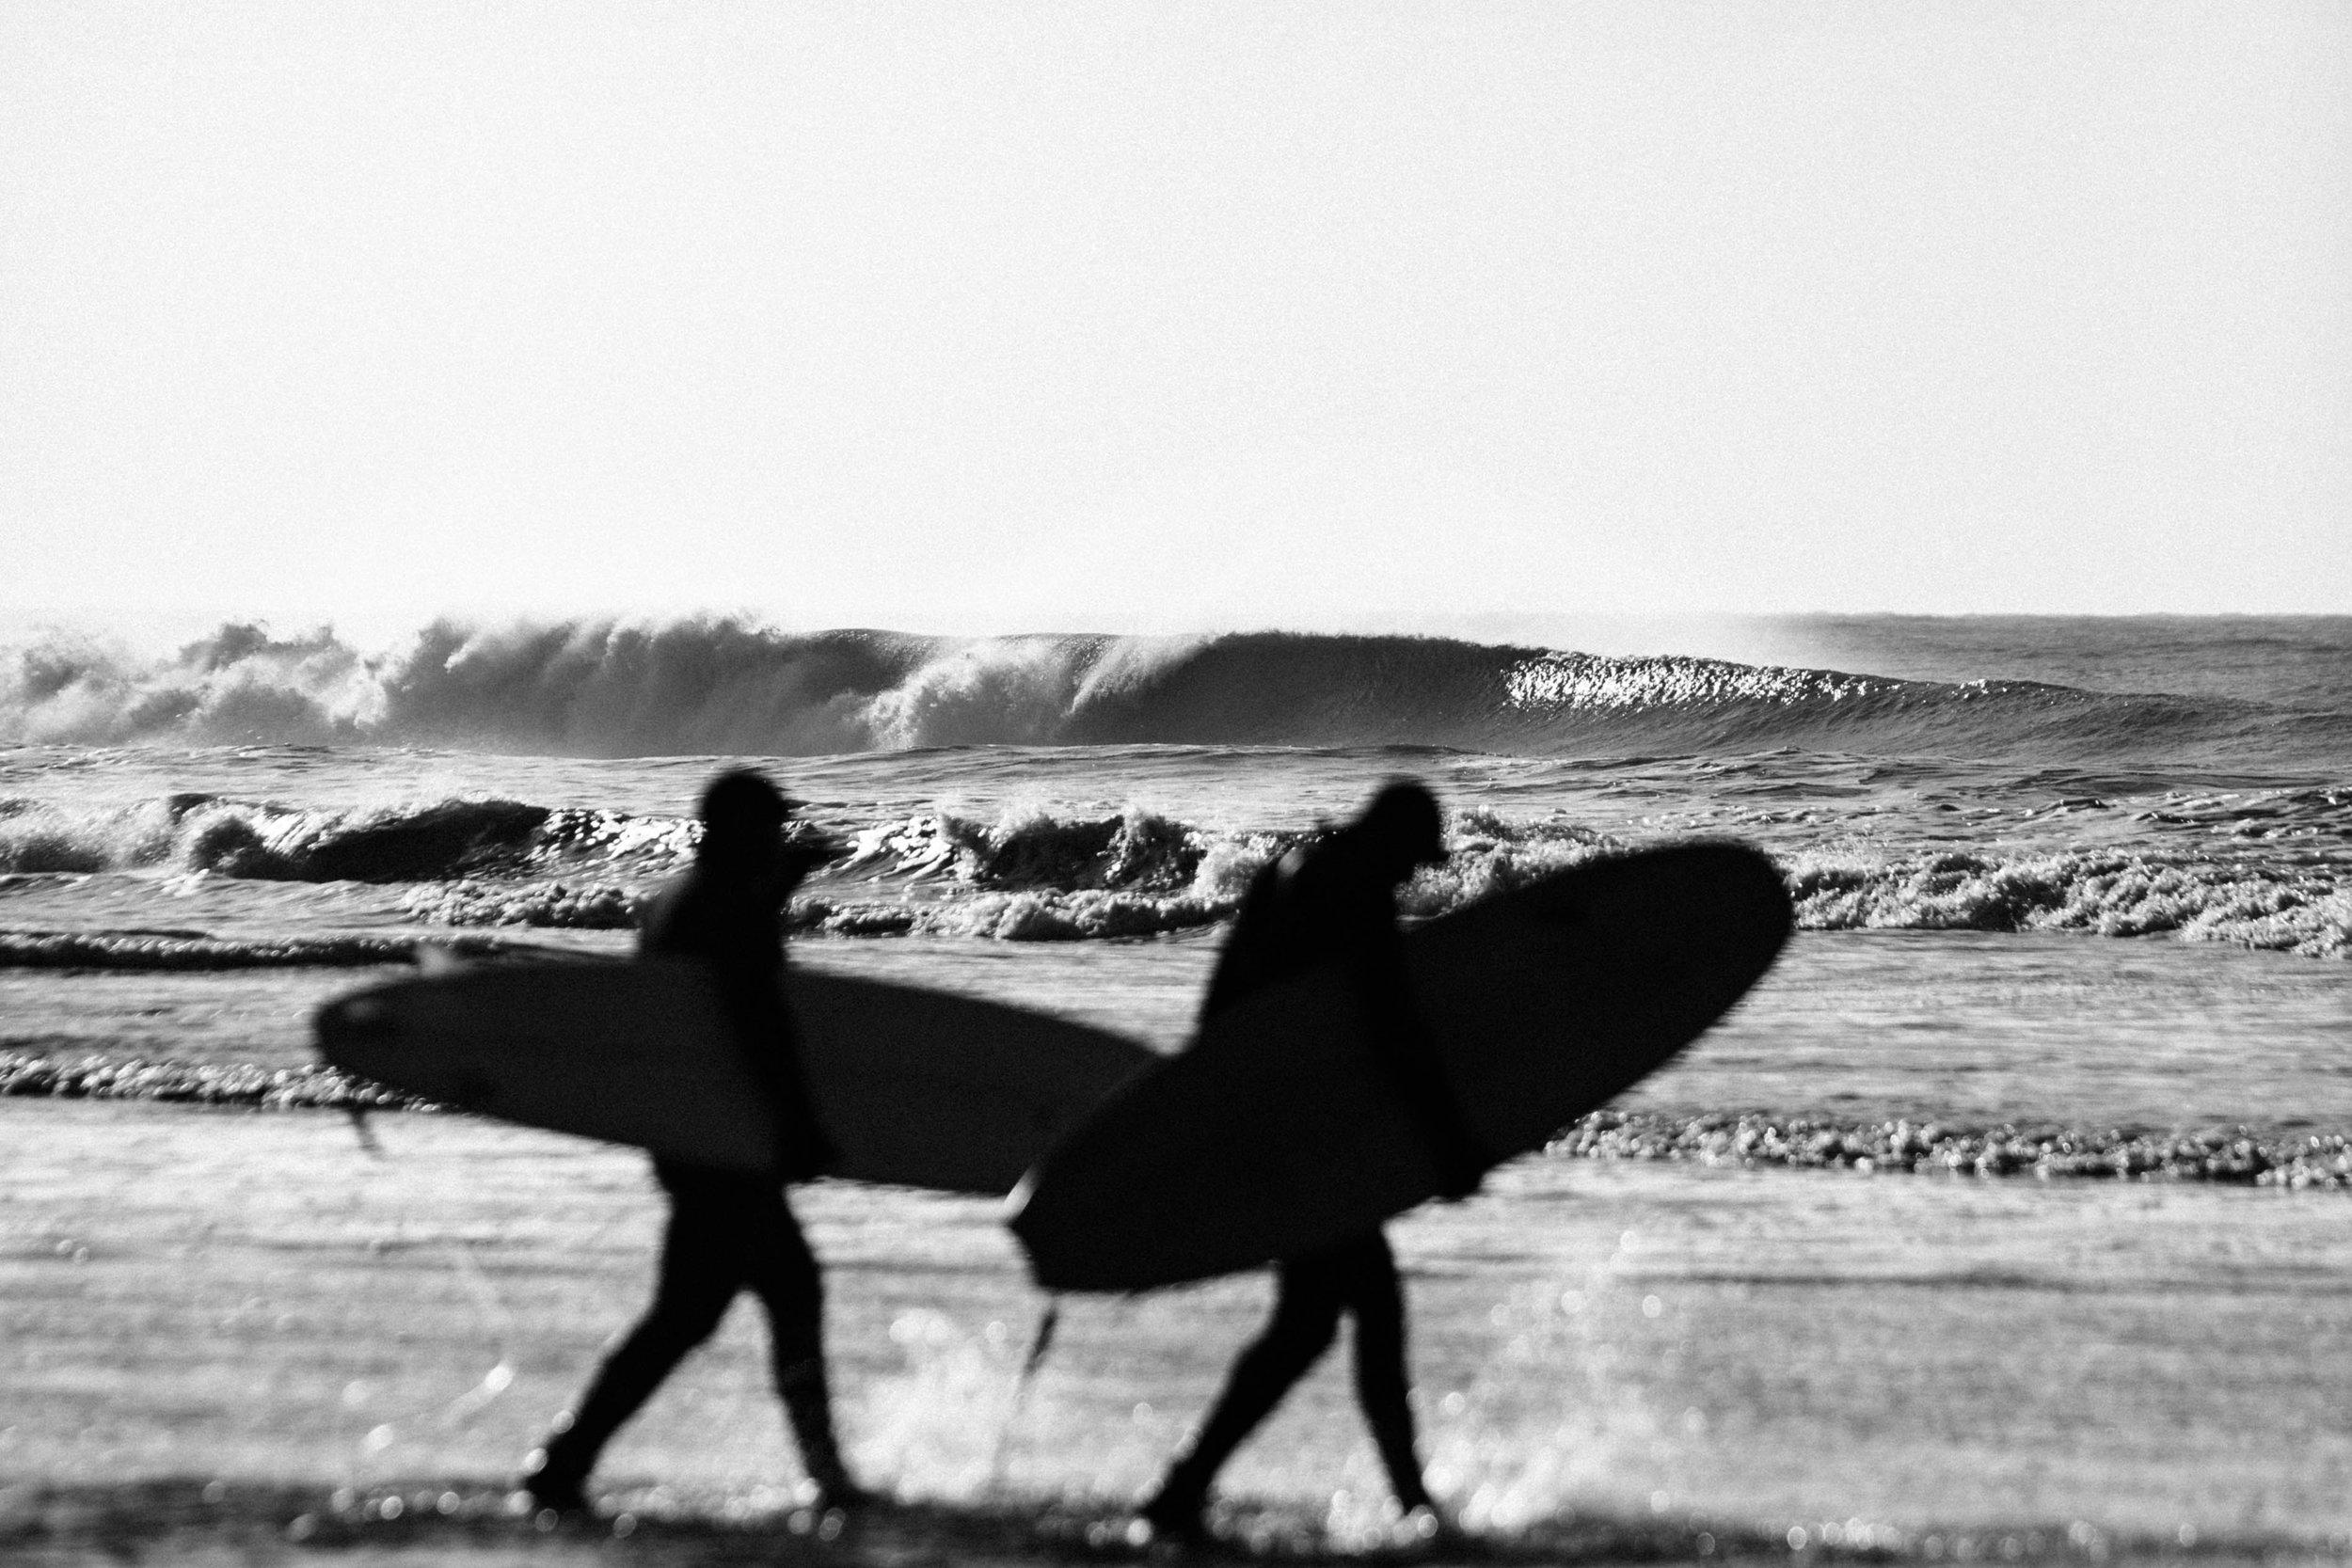 Alex_Sedgmond_Photography-Cardiff-SouthWales-PorthcawlRestbay-Surfing-EzraHames-50.jpg